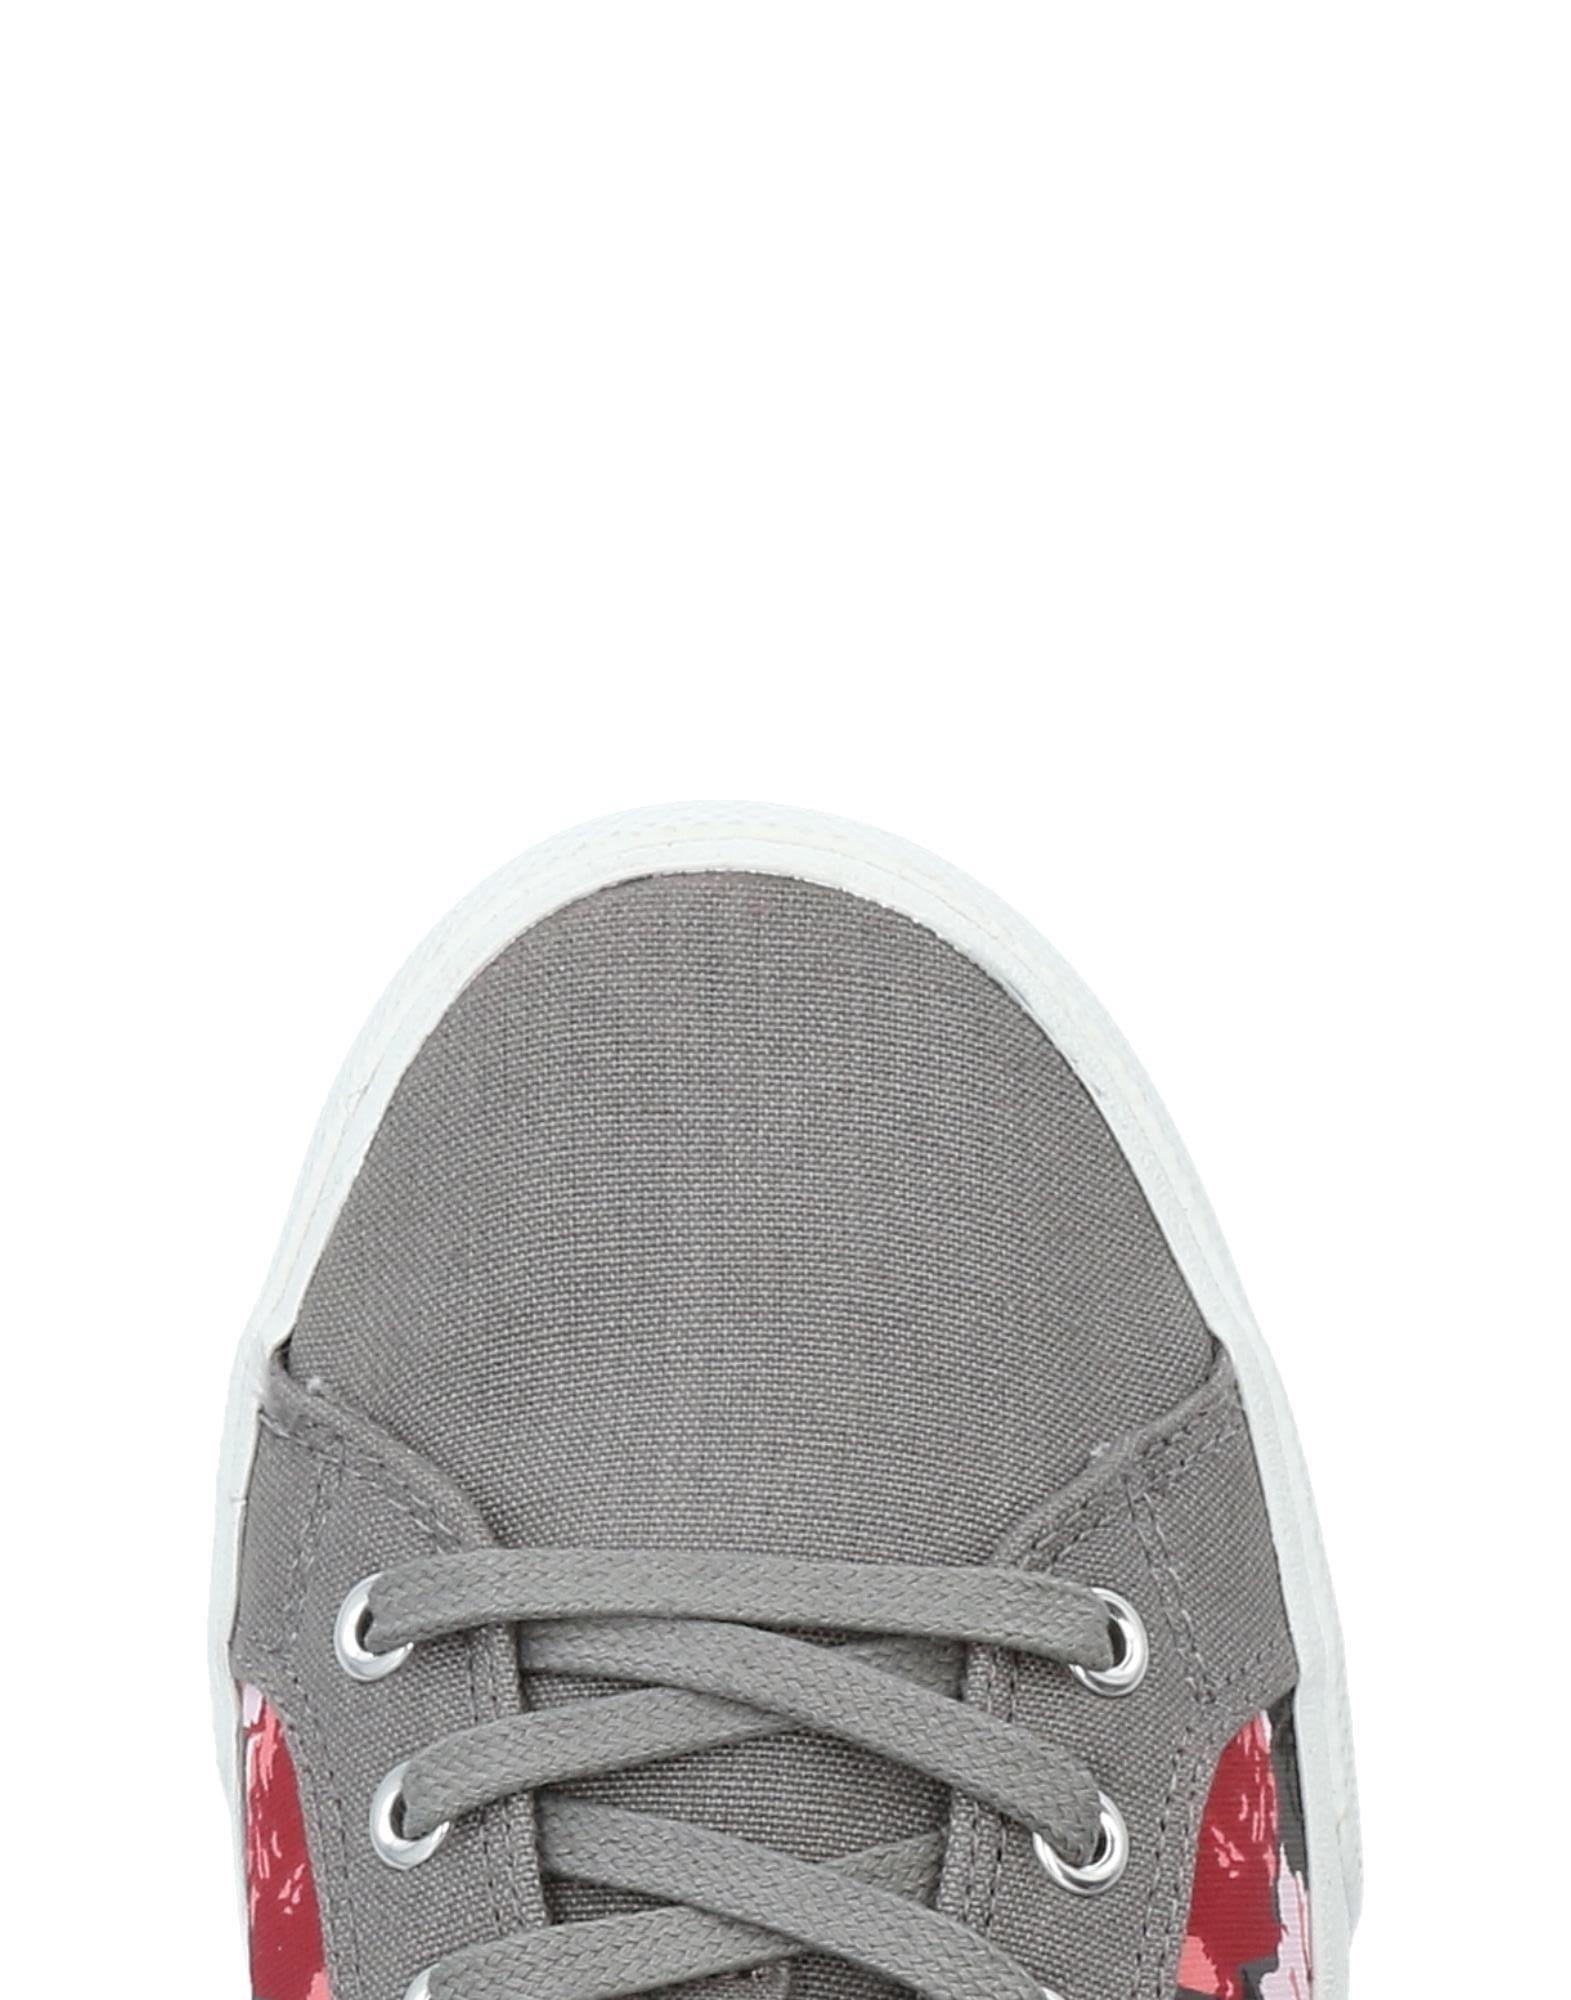 Sneakers Bucketfeet Femme - Sneakers Bucketfeet sur